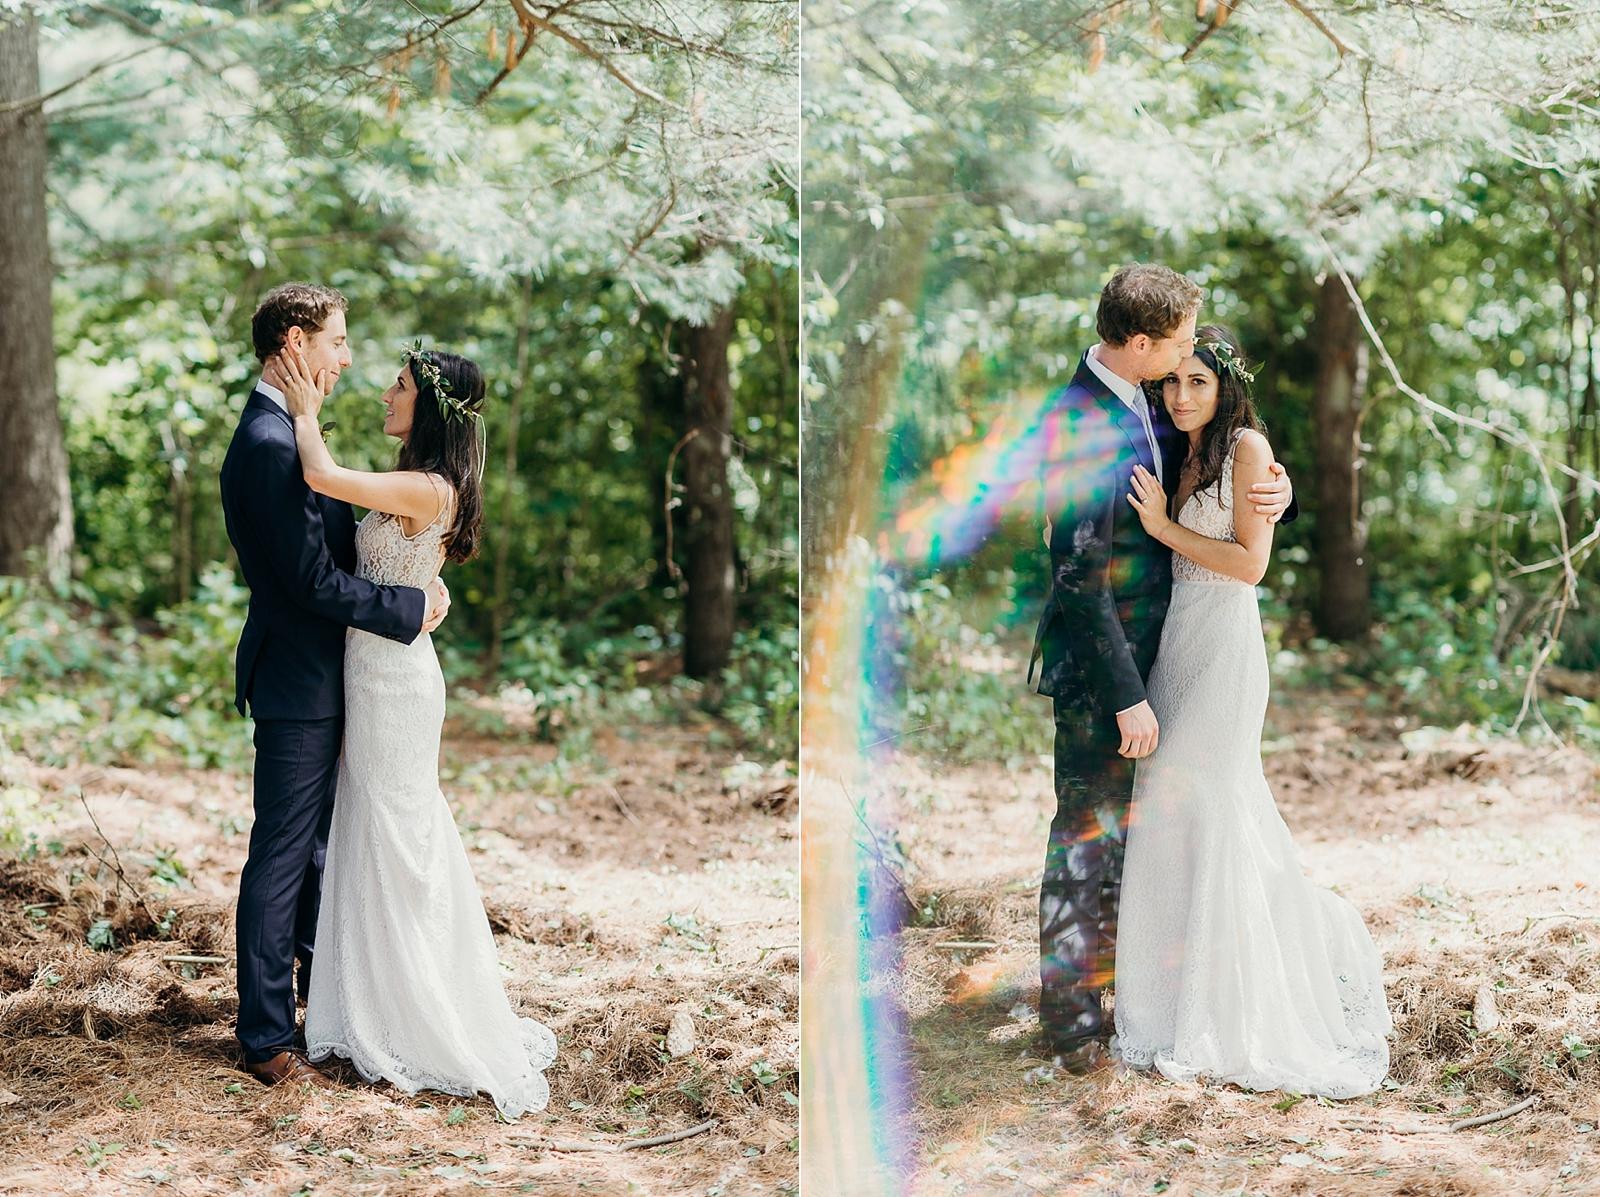 SpiceAcres-Wedding-Kat+Zak-17.jpg